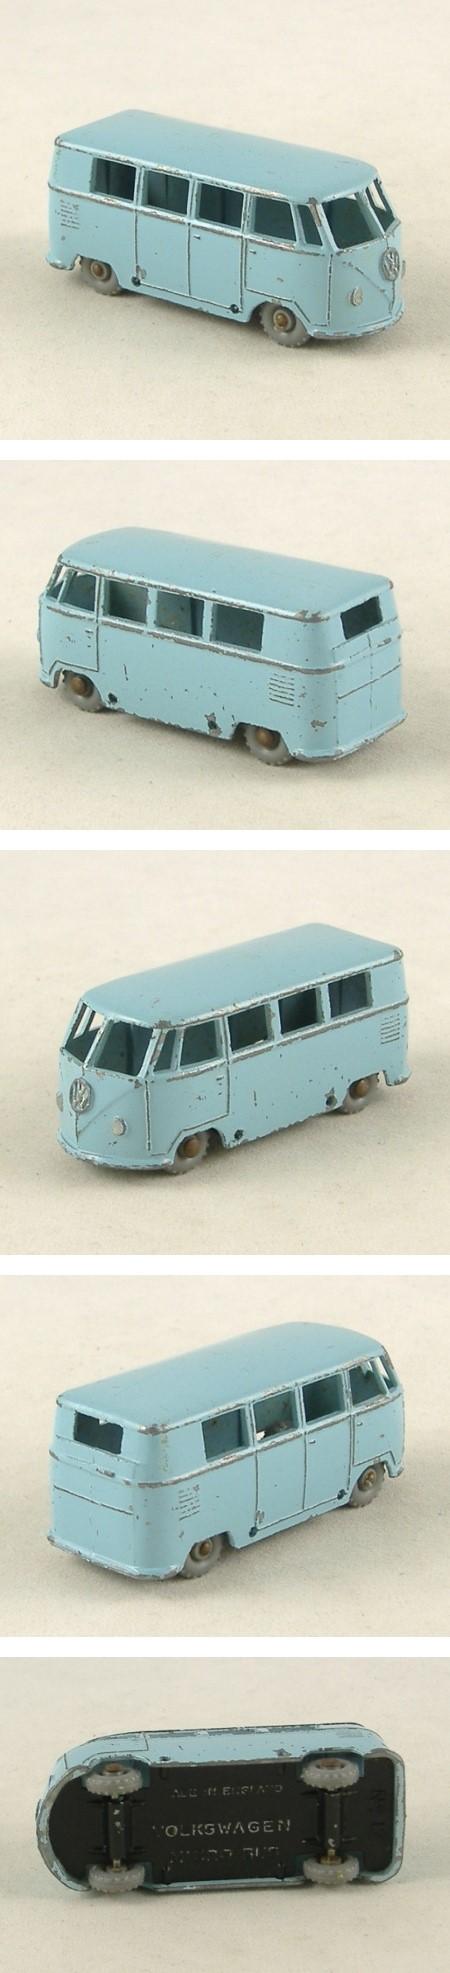 Search the Site Miniaturas, Accesorios, Transporte publico